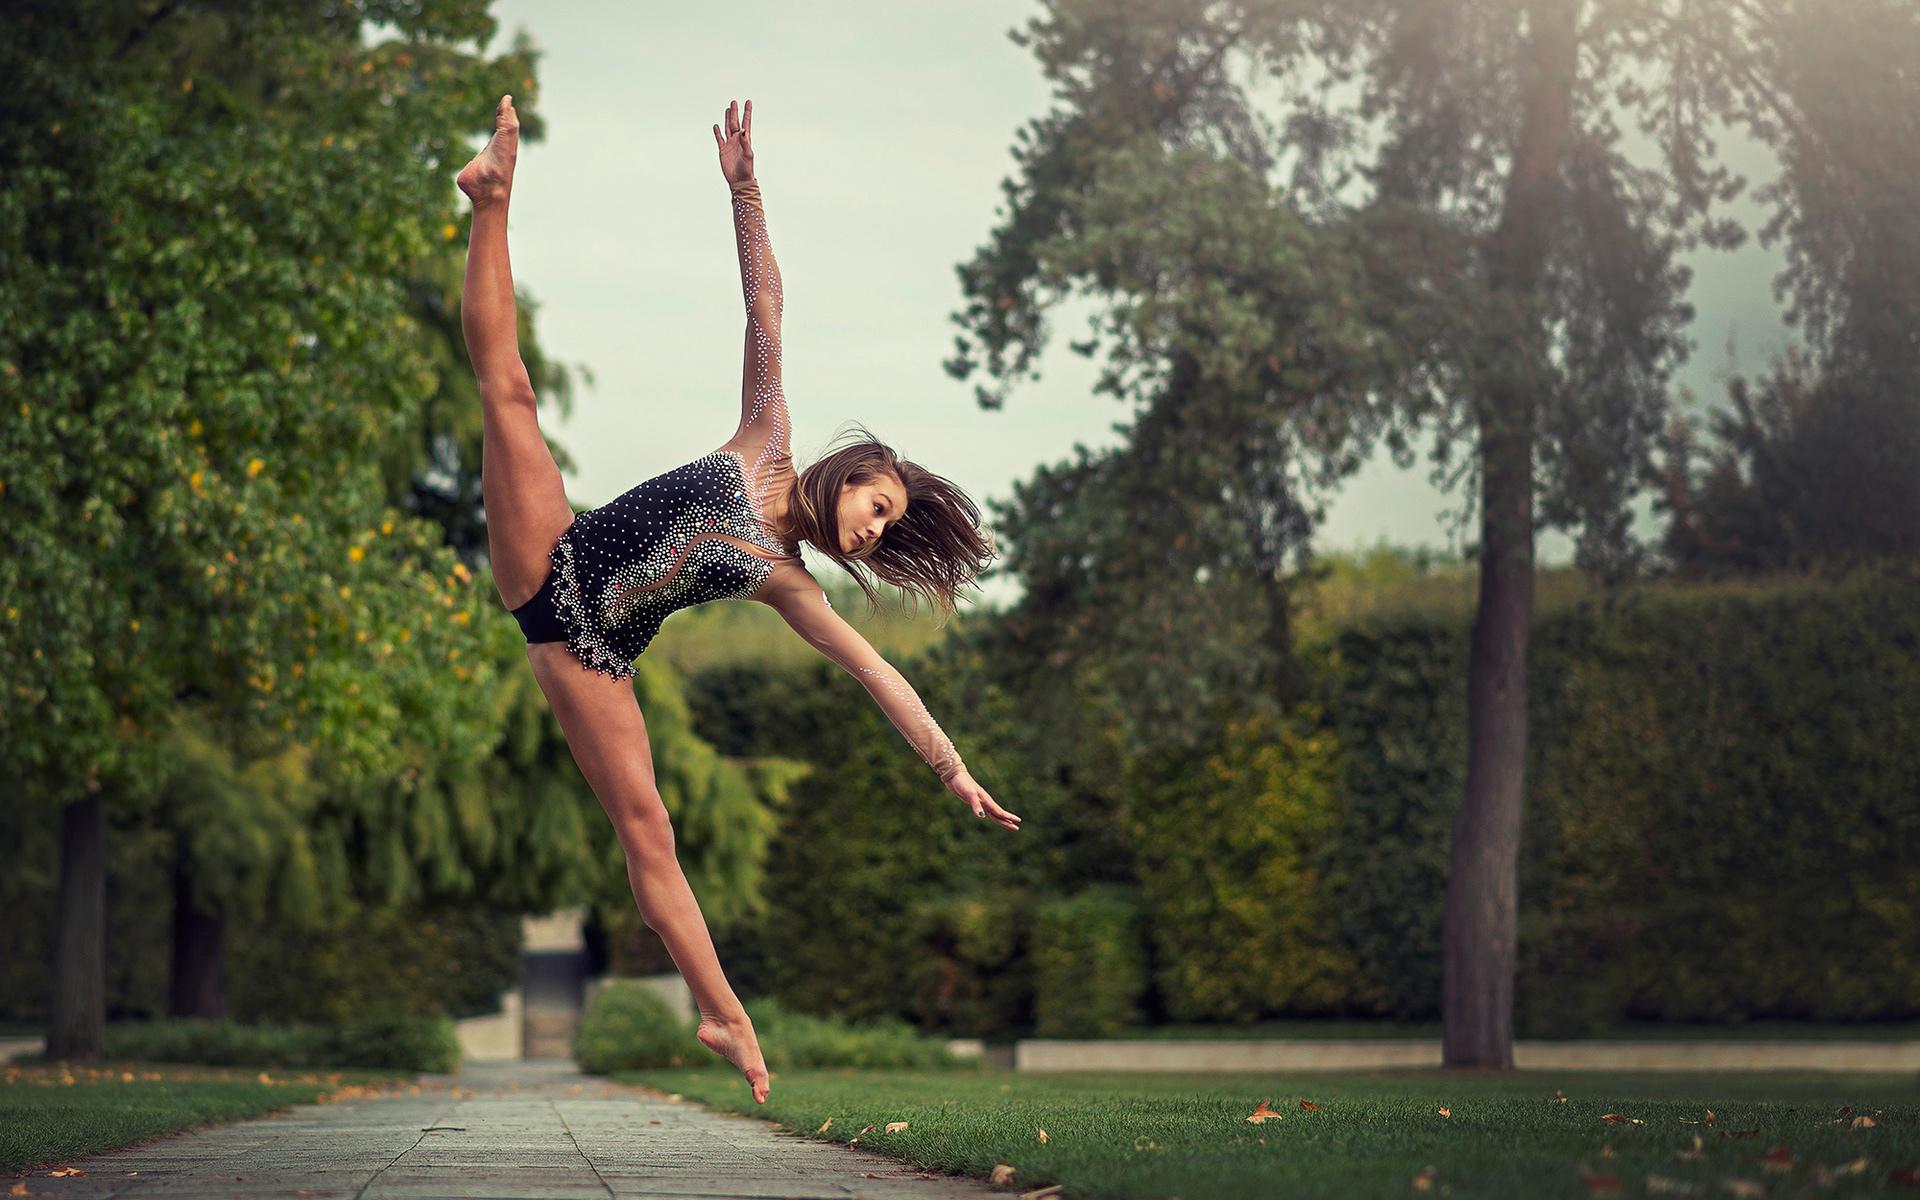 sport-gimnastka-na-shpagate-foto-pornoaktrisa-yana-lukashenko